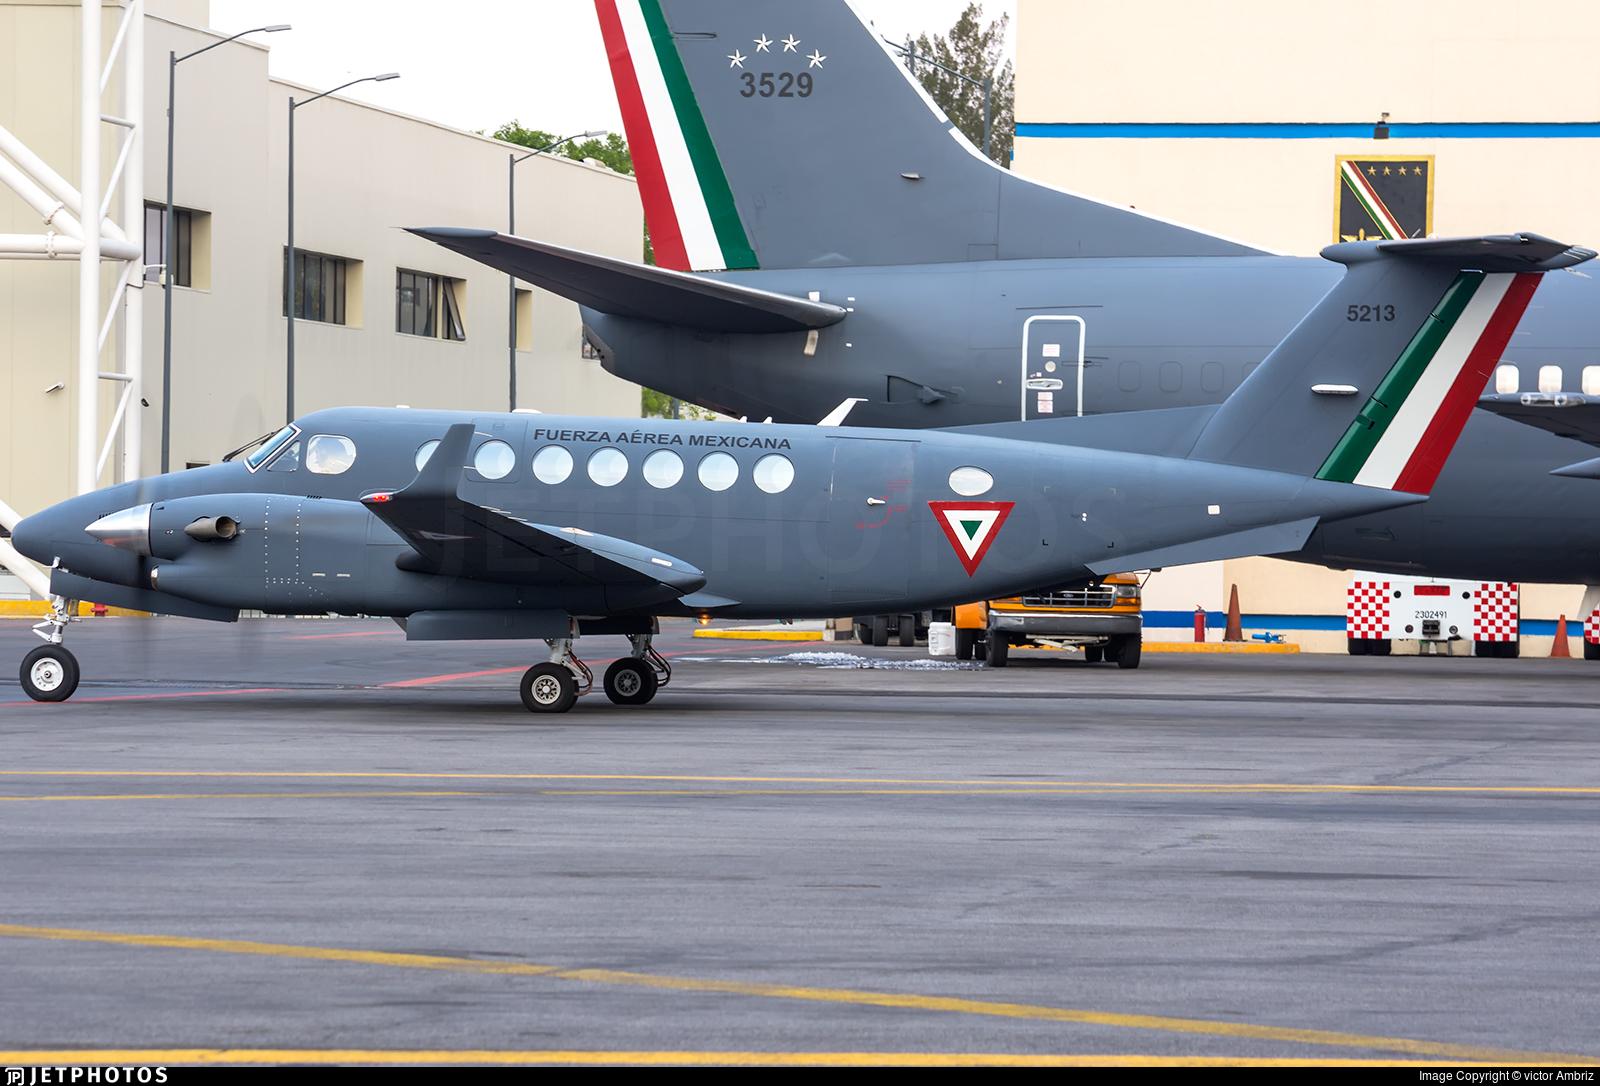 5213 - Beechcraft B300 King Air 350i - Mexico - Air Force